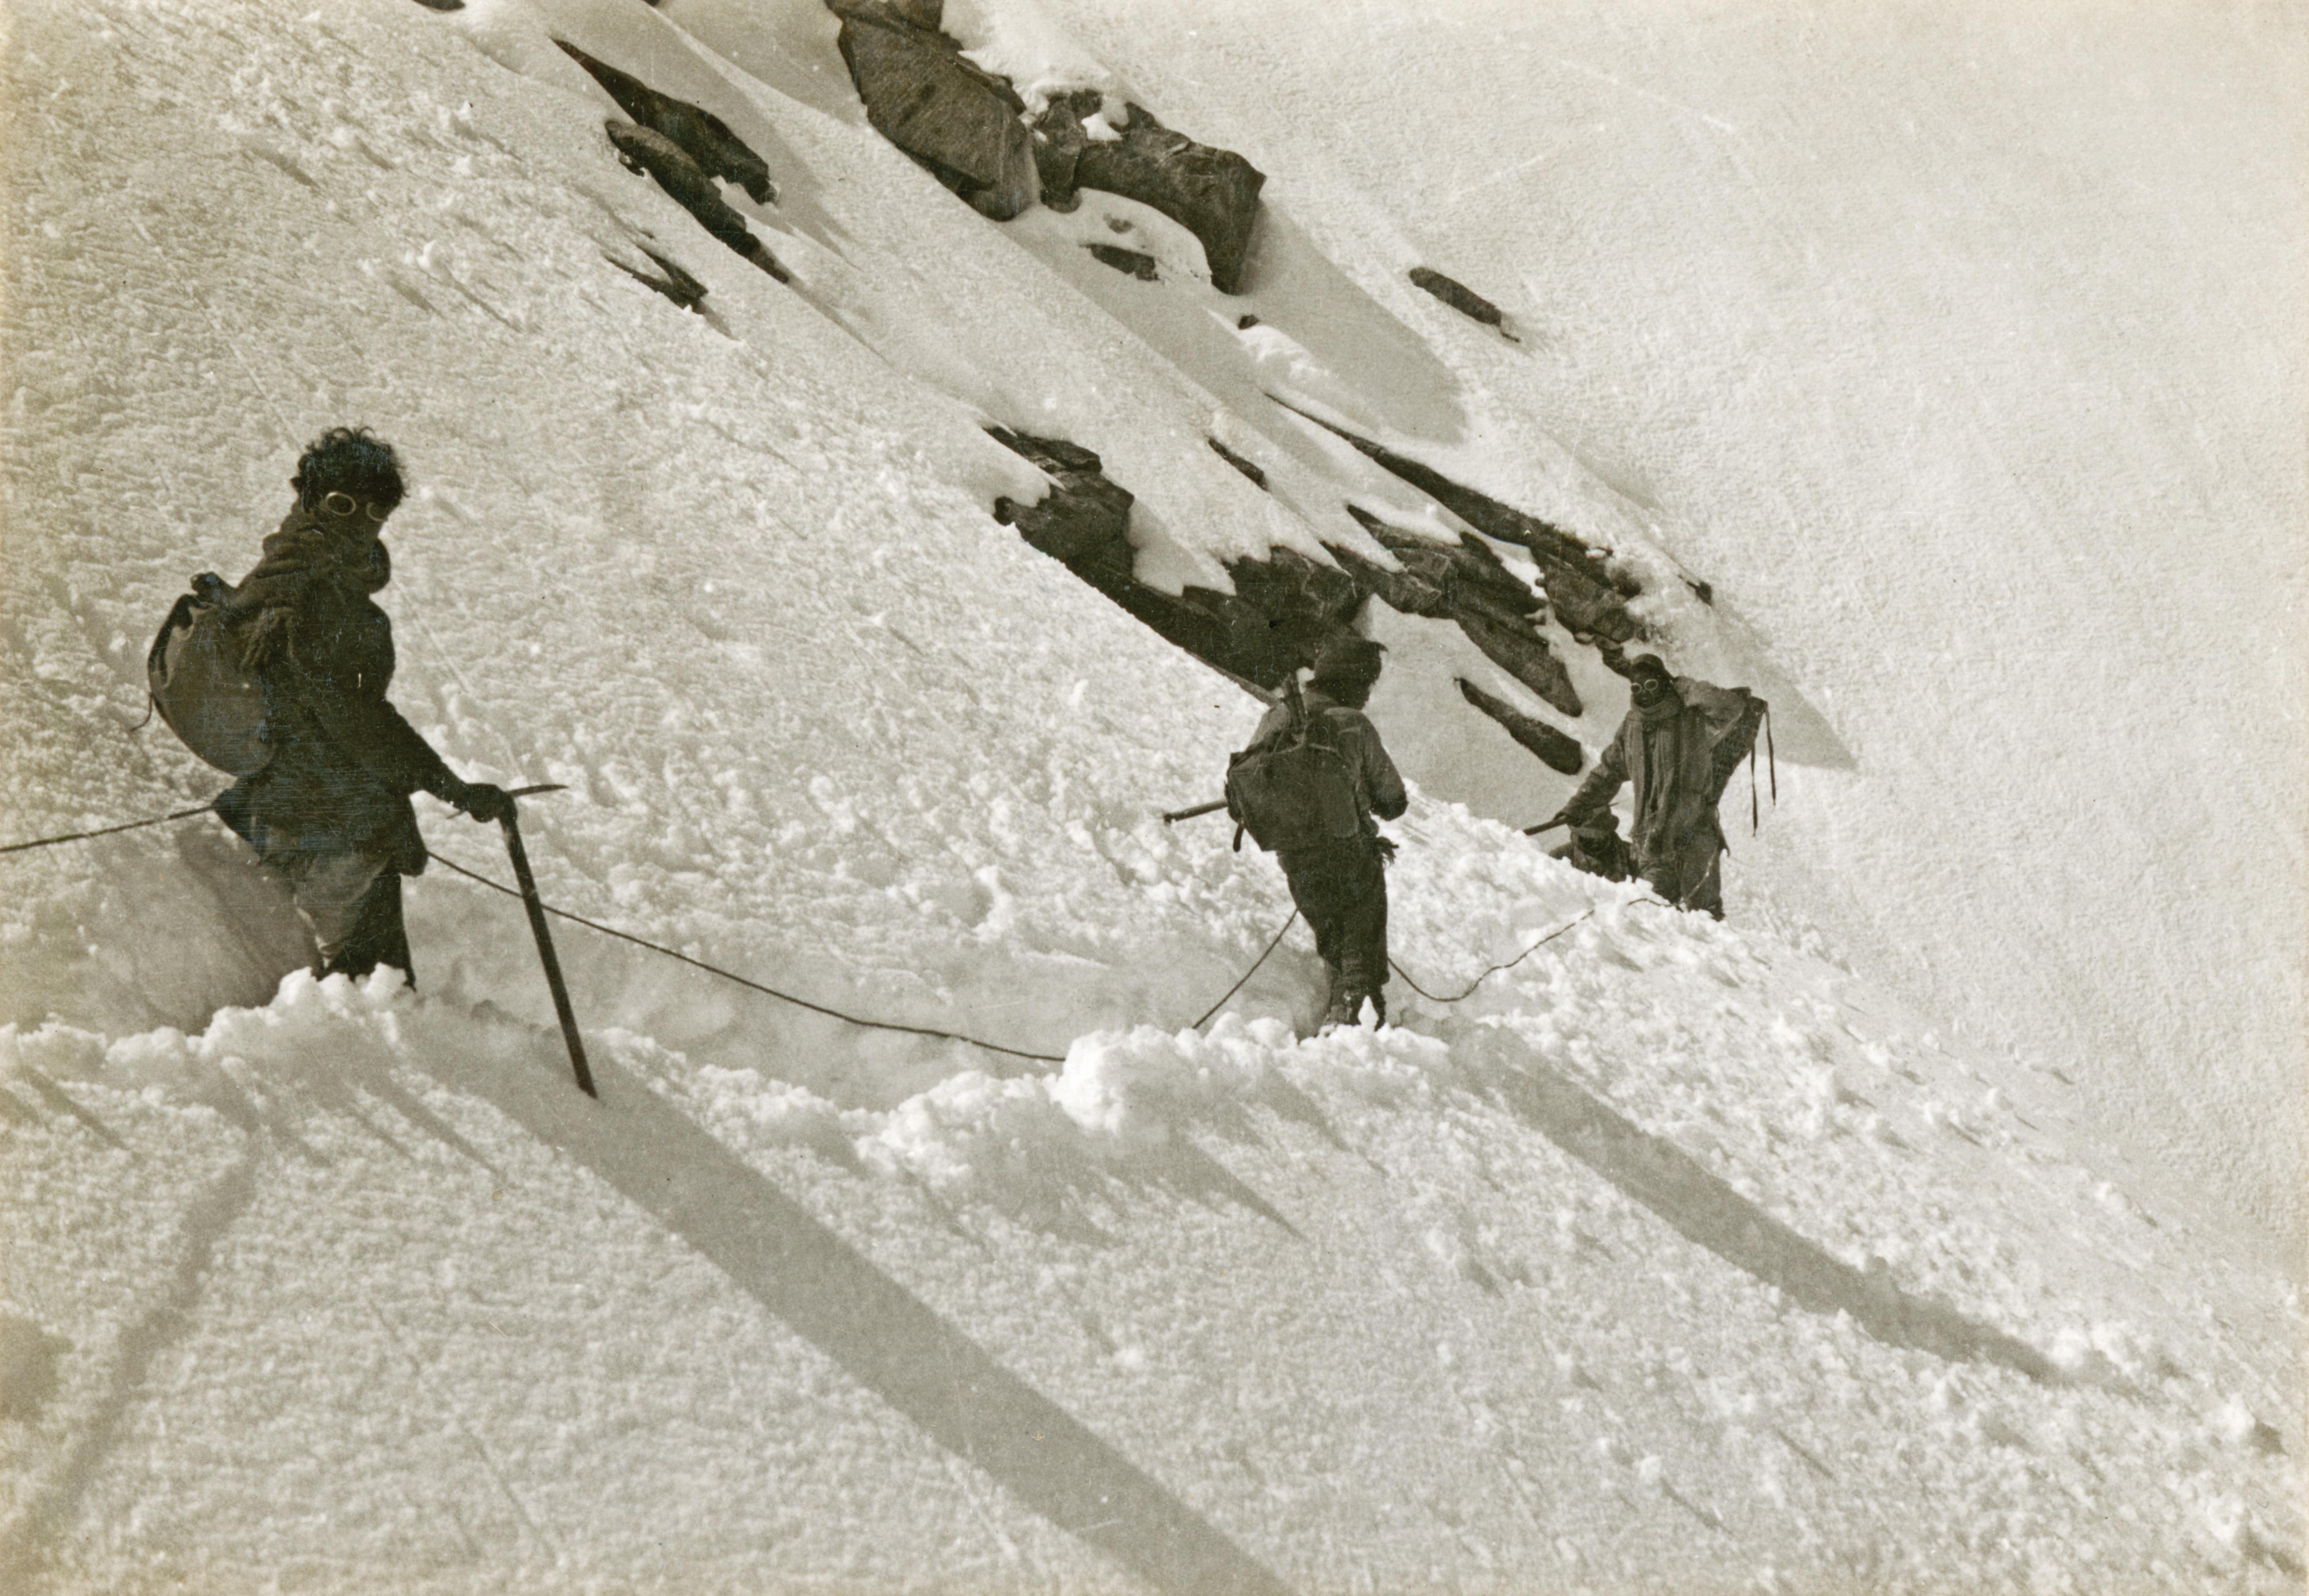 Climbers descending from Carpo Ri, Everest, 1921